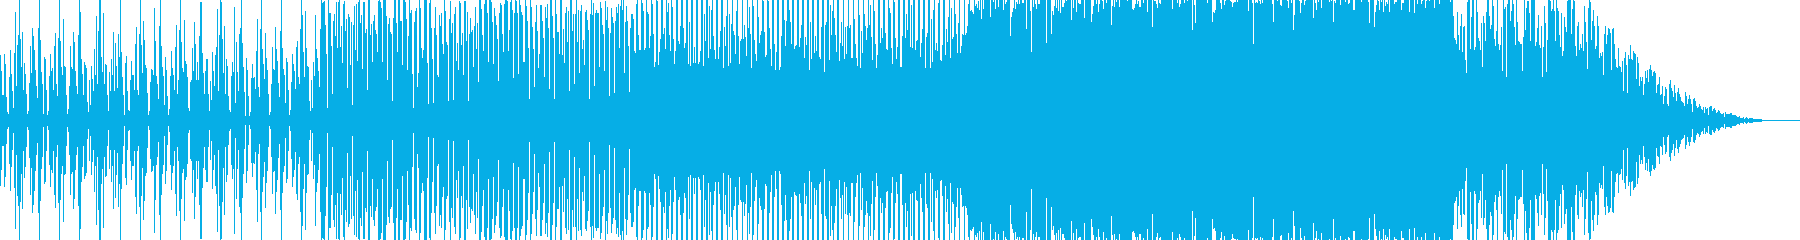 ★New Minimal Technoの再生済みの波形